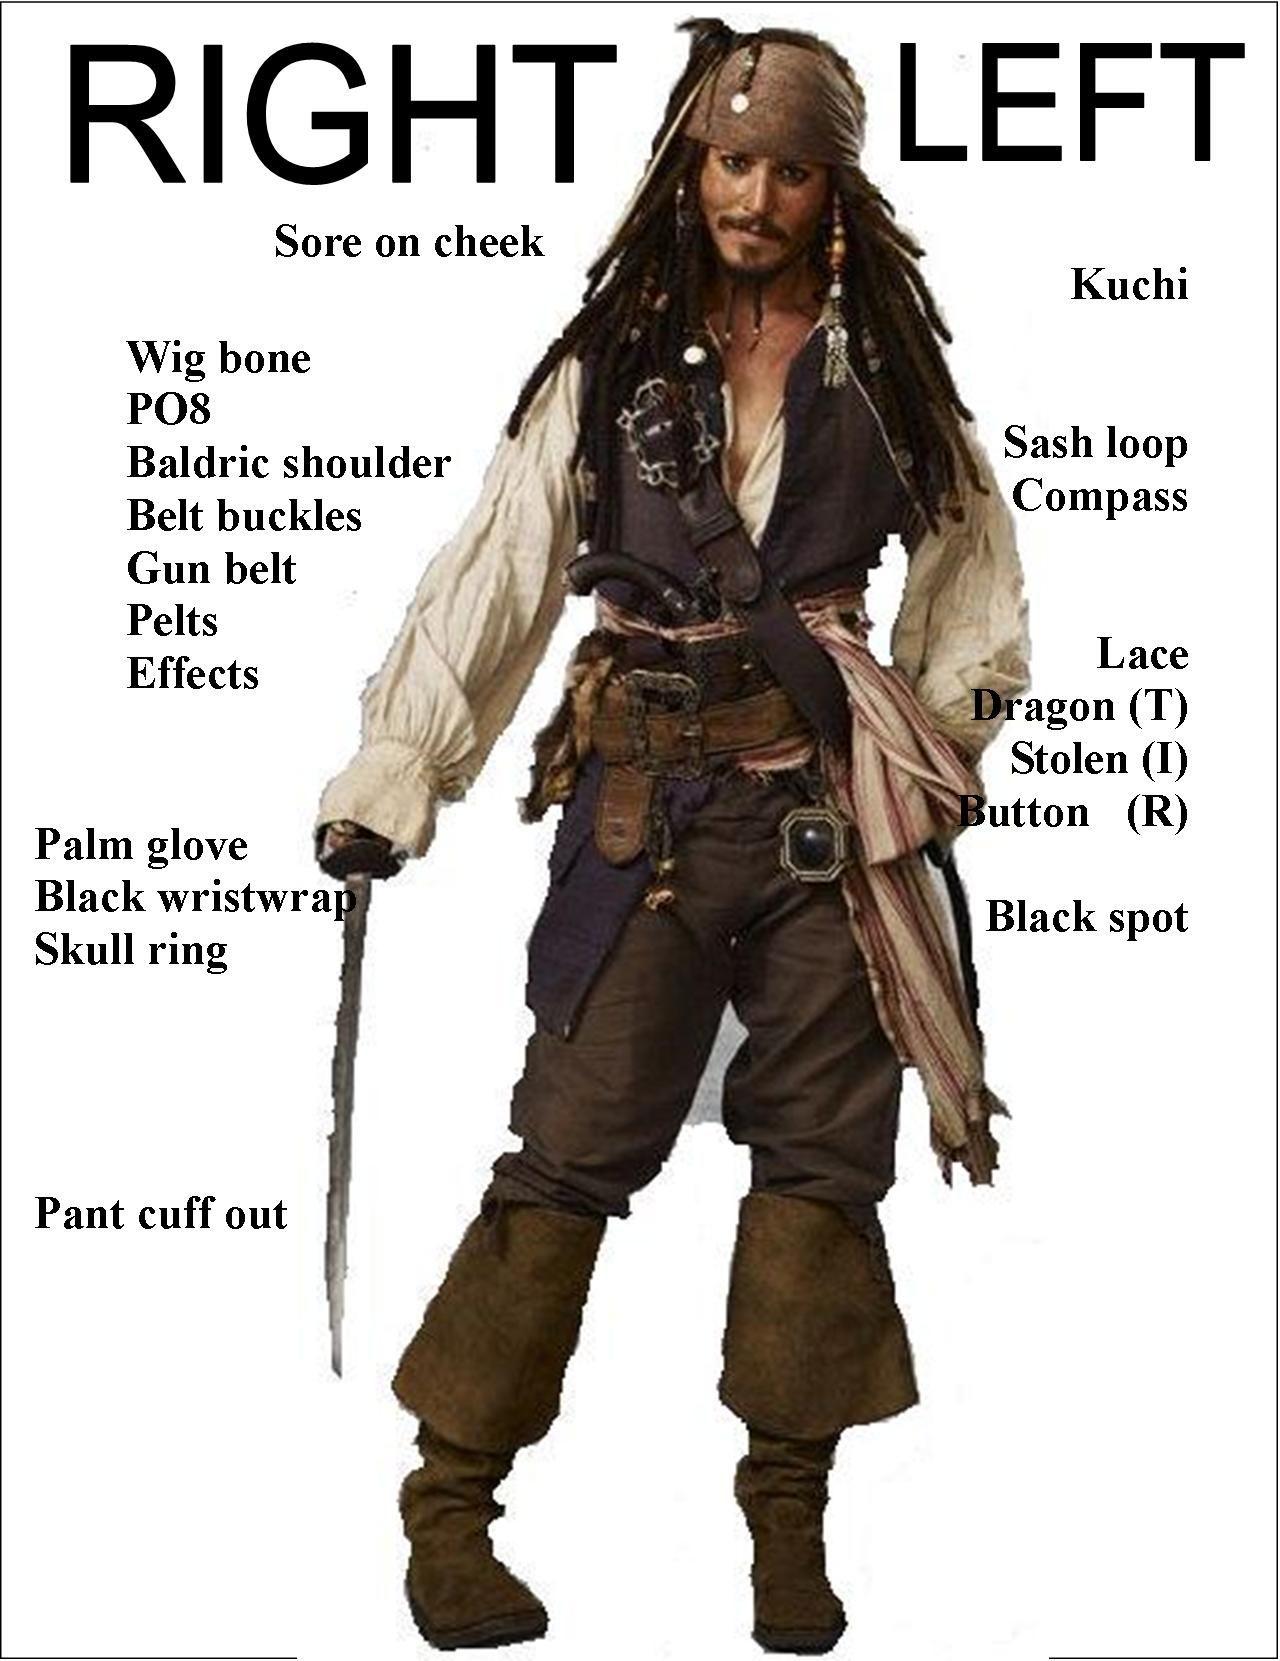 Men's Headbands Men's Accessories Pirates Of The Caribbean Jack Sparrow Wig Headband Hat Costume Cosplay Set